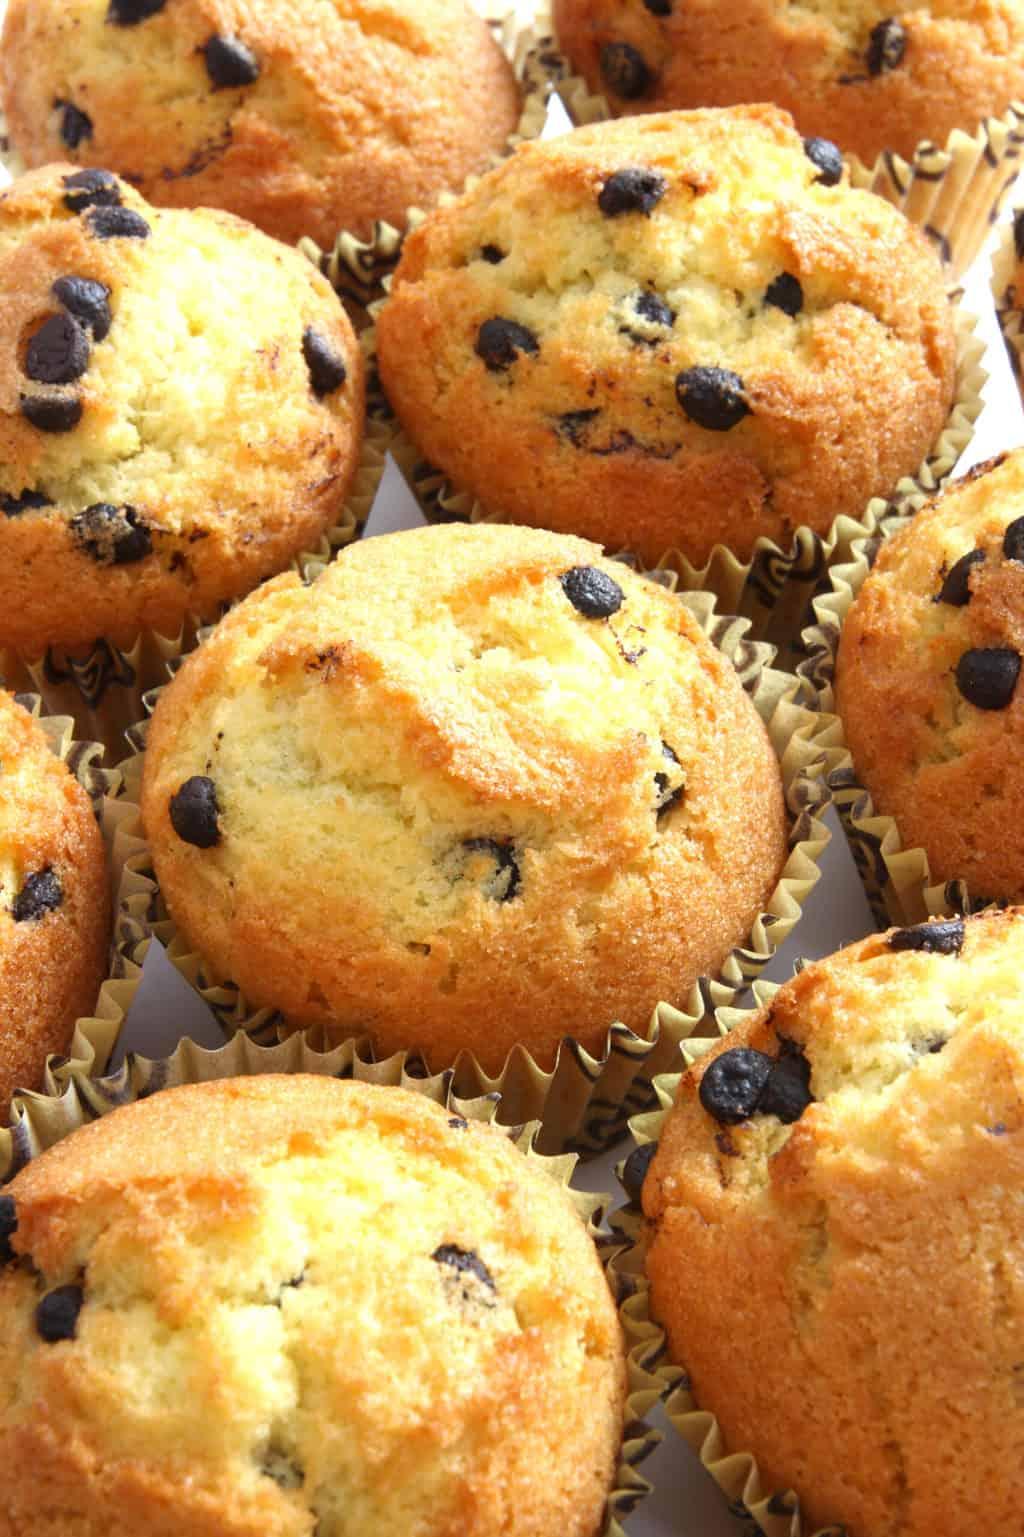 Keto chocolate chip muffins on platter